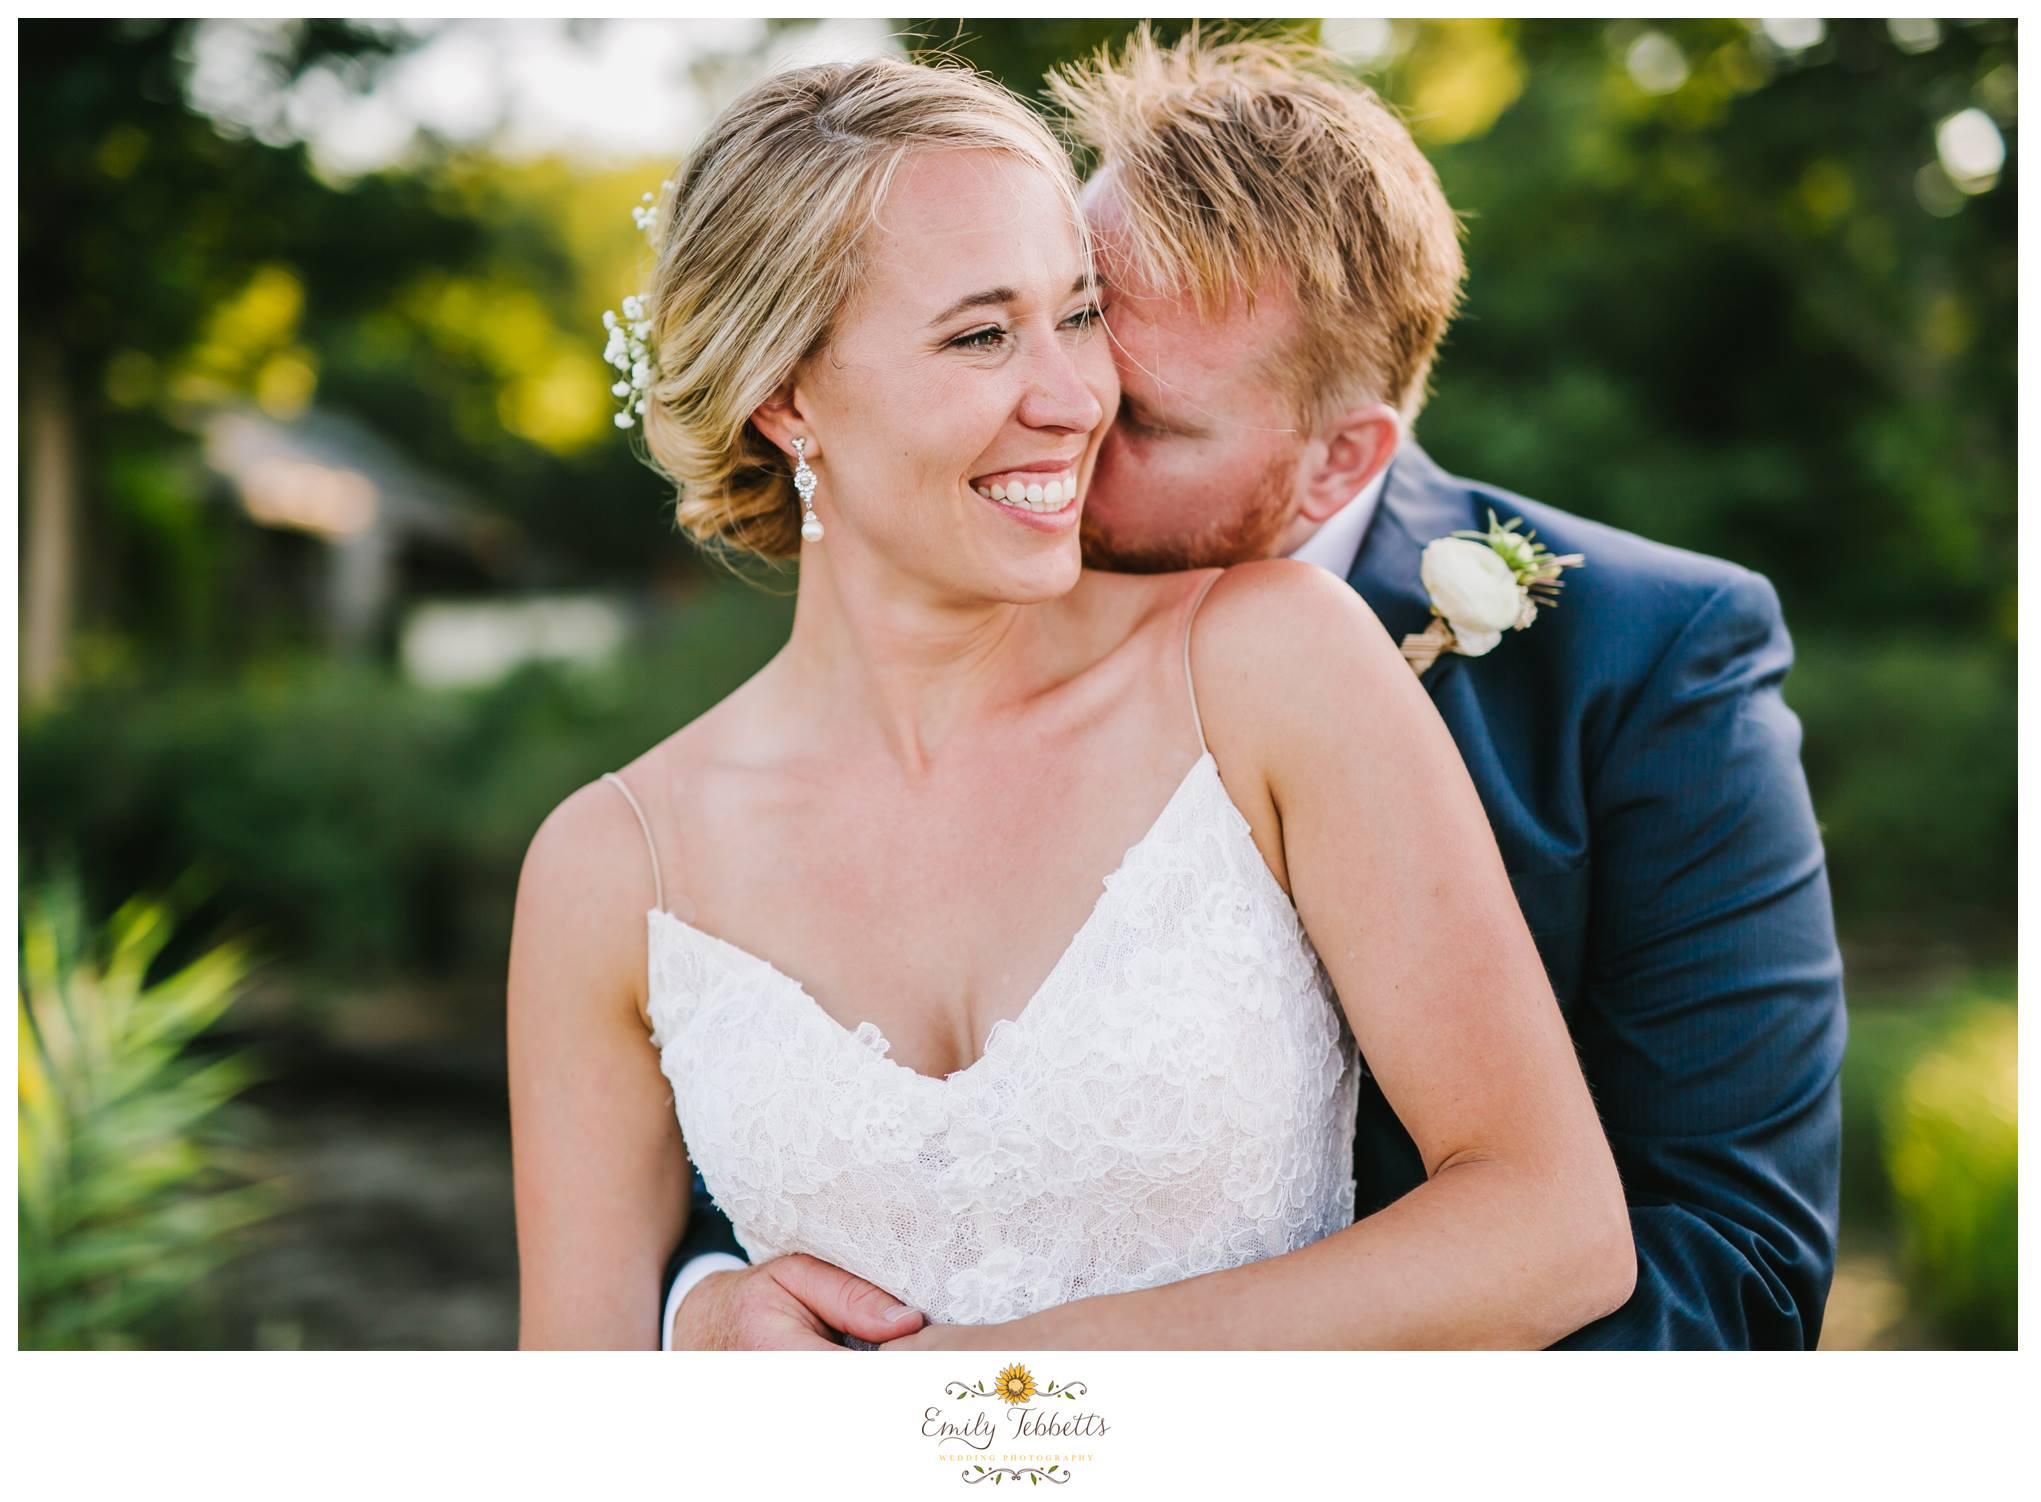 Emily Tebbetts Photography Wedding || Private Residence : Dauntless Club, Essex, CT 3.jpg